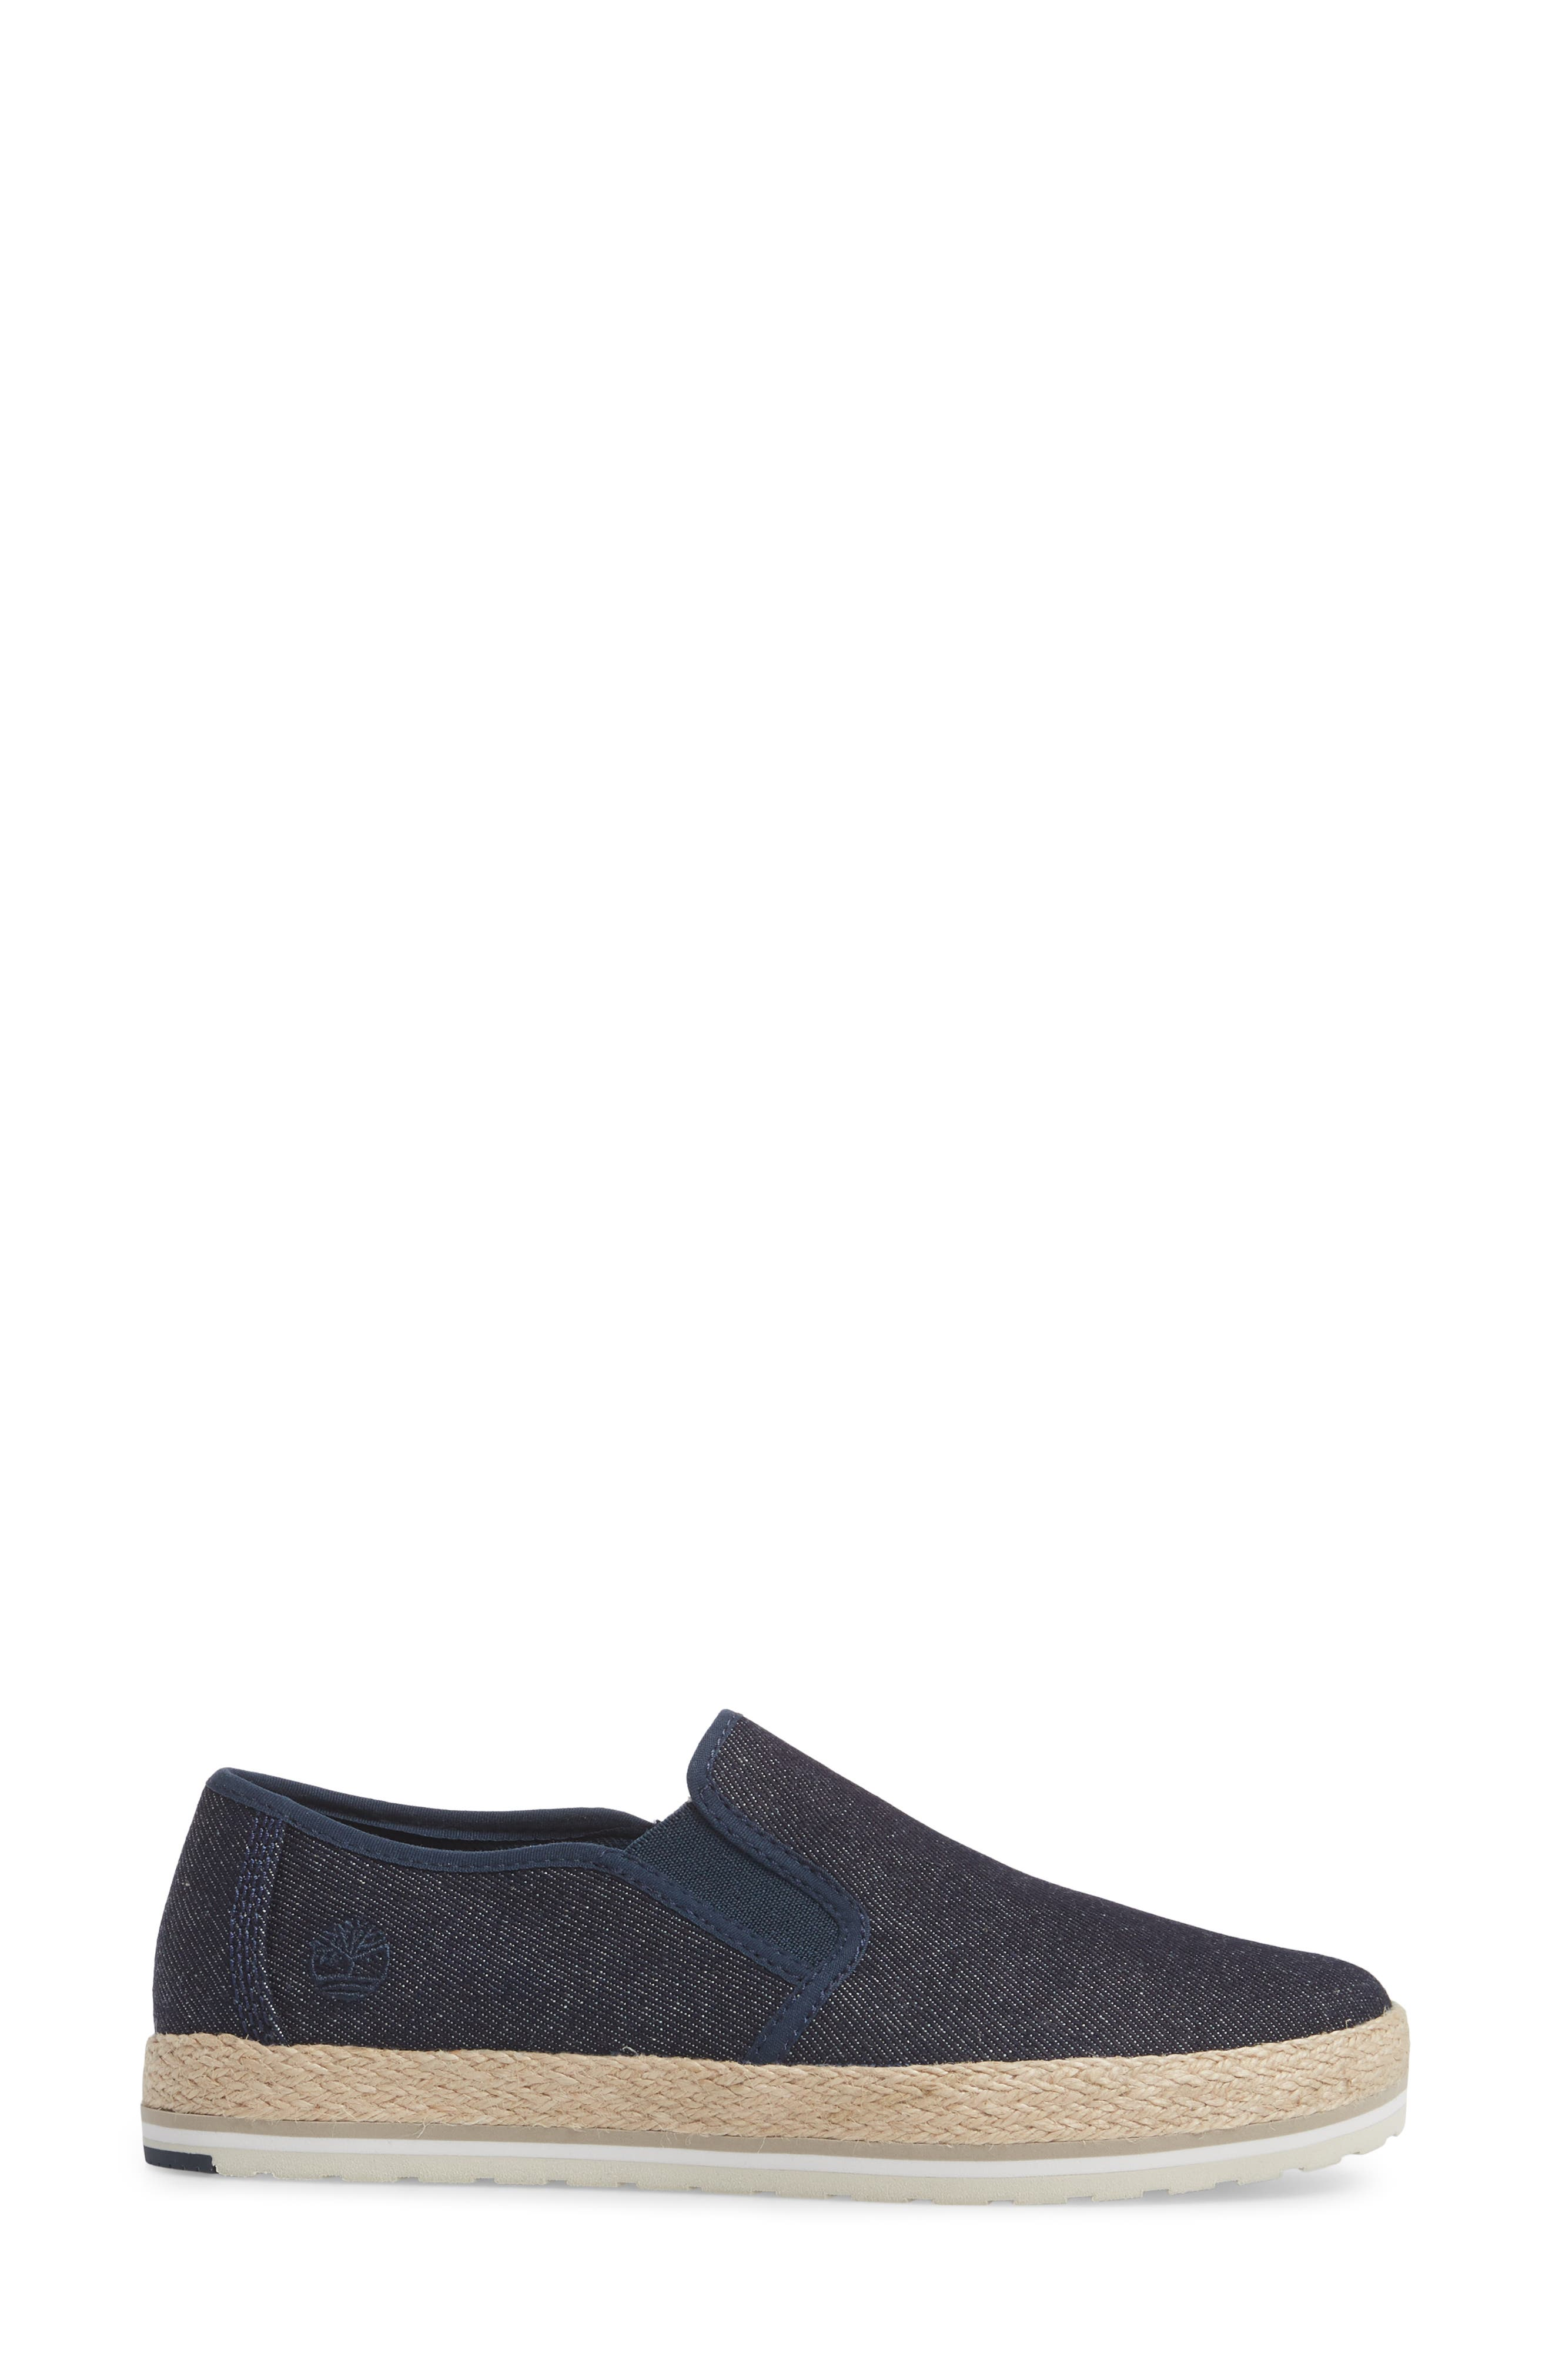 Eivissa Sea Slip-On Sneaker,                             Alternate thumbnail 3, color,                             Navy Canvas